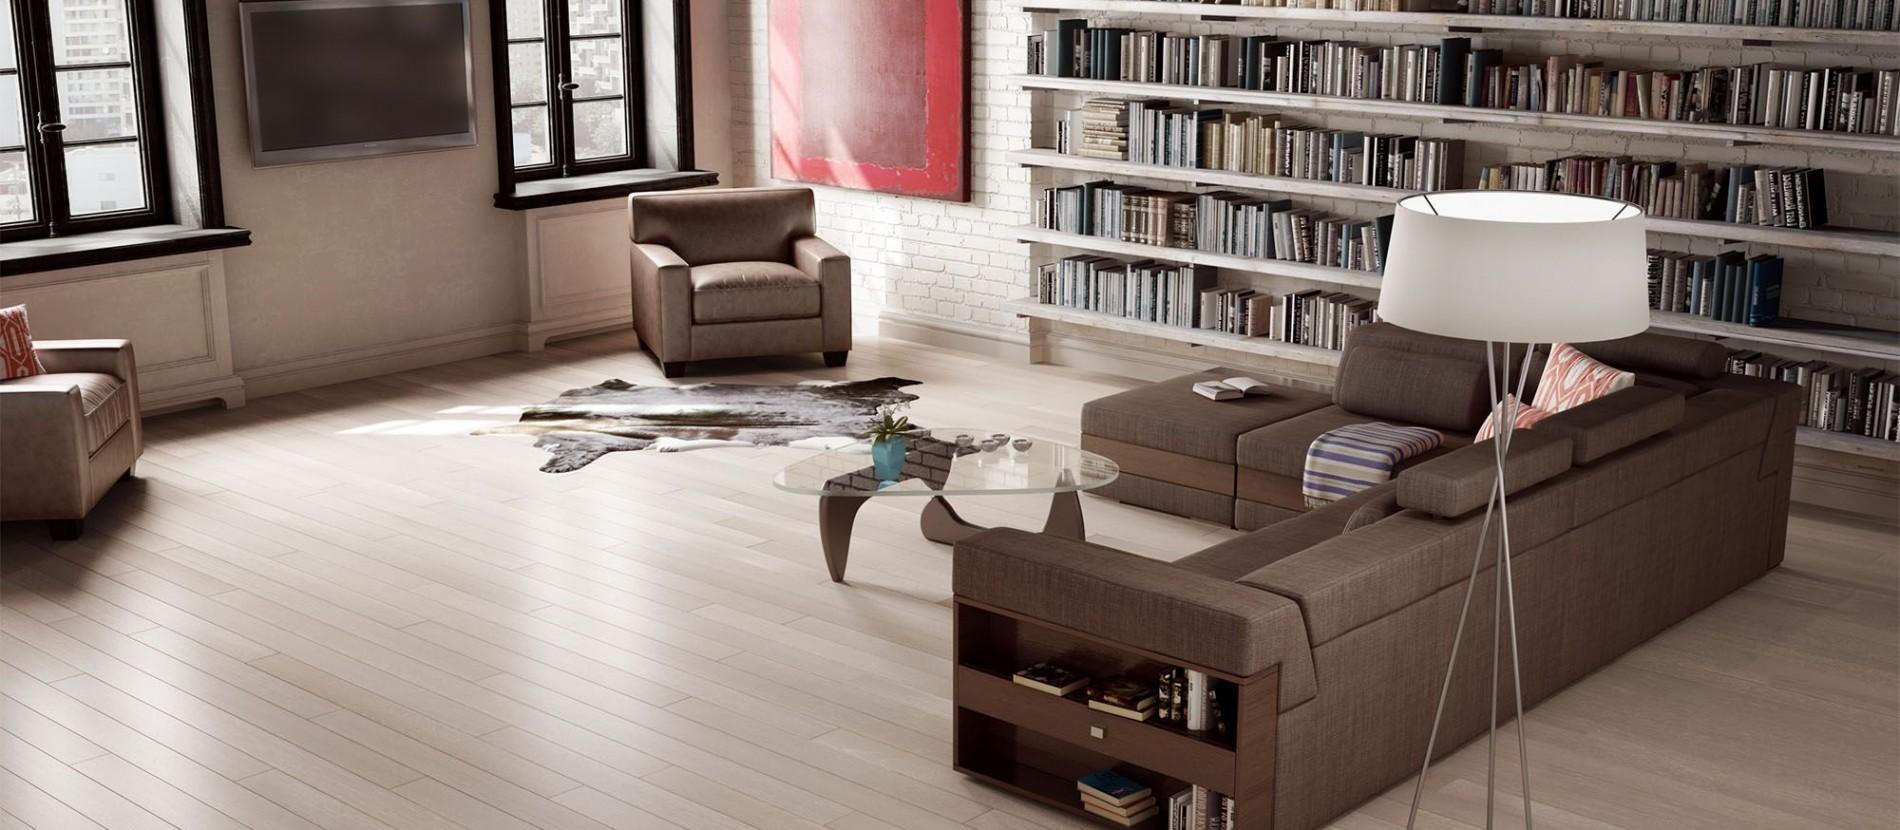 Beautiful refinished floors!